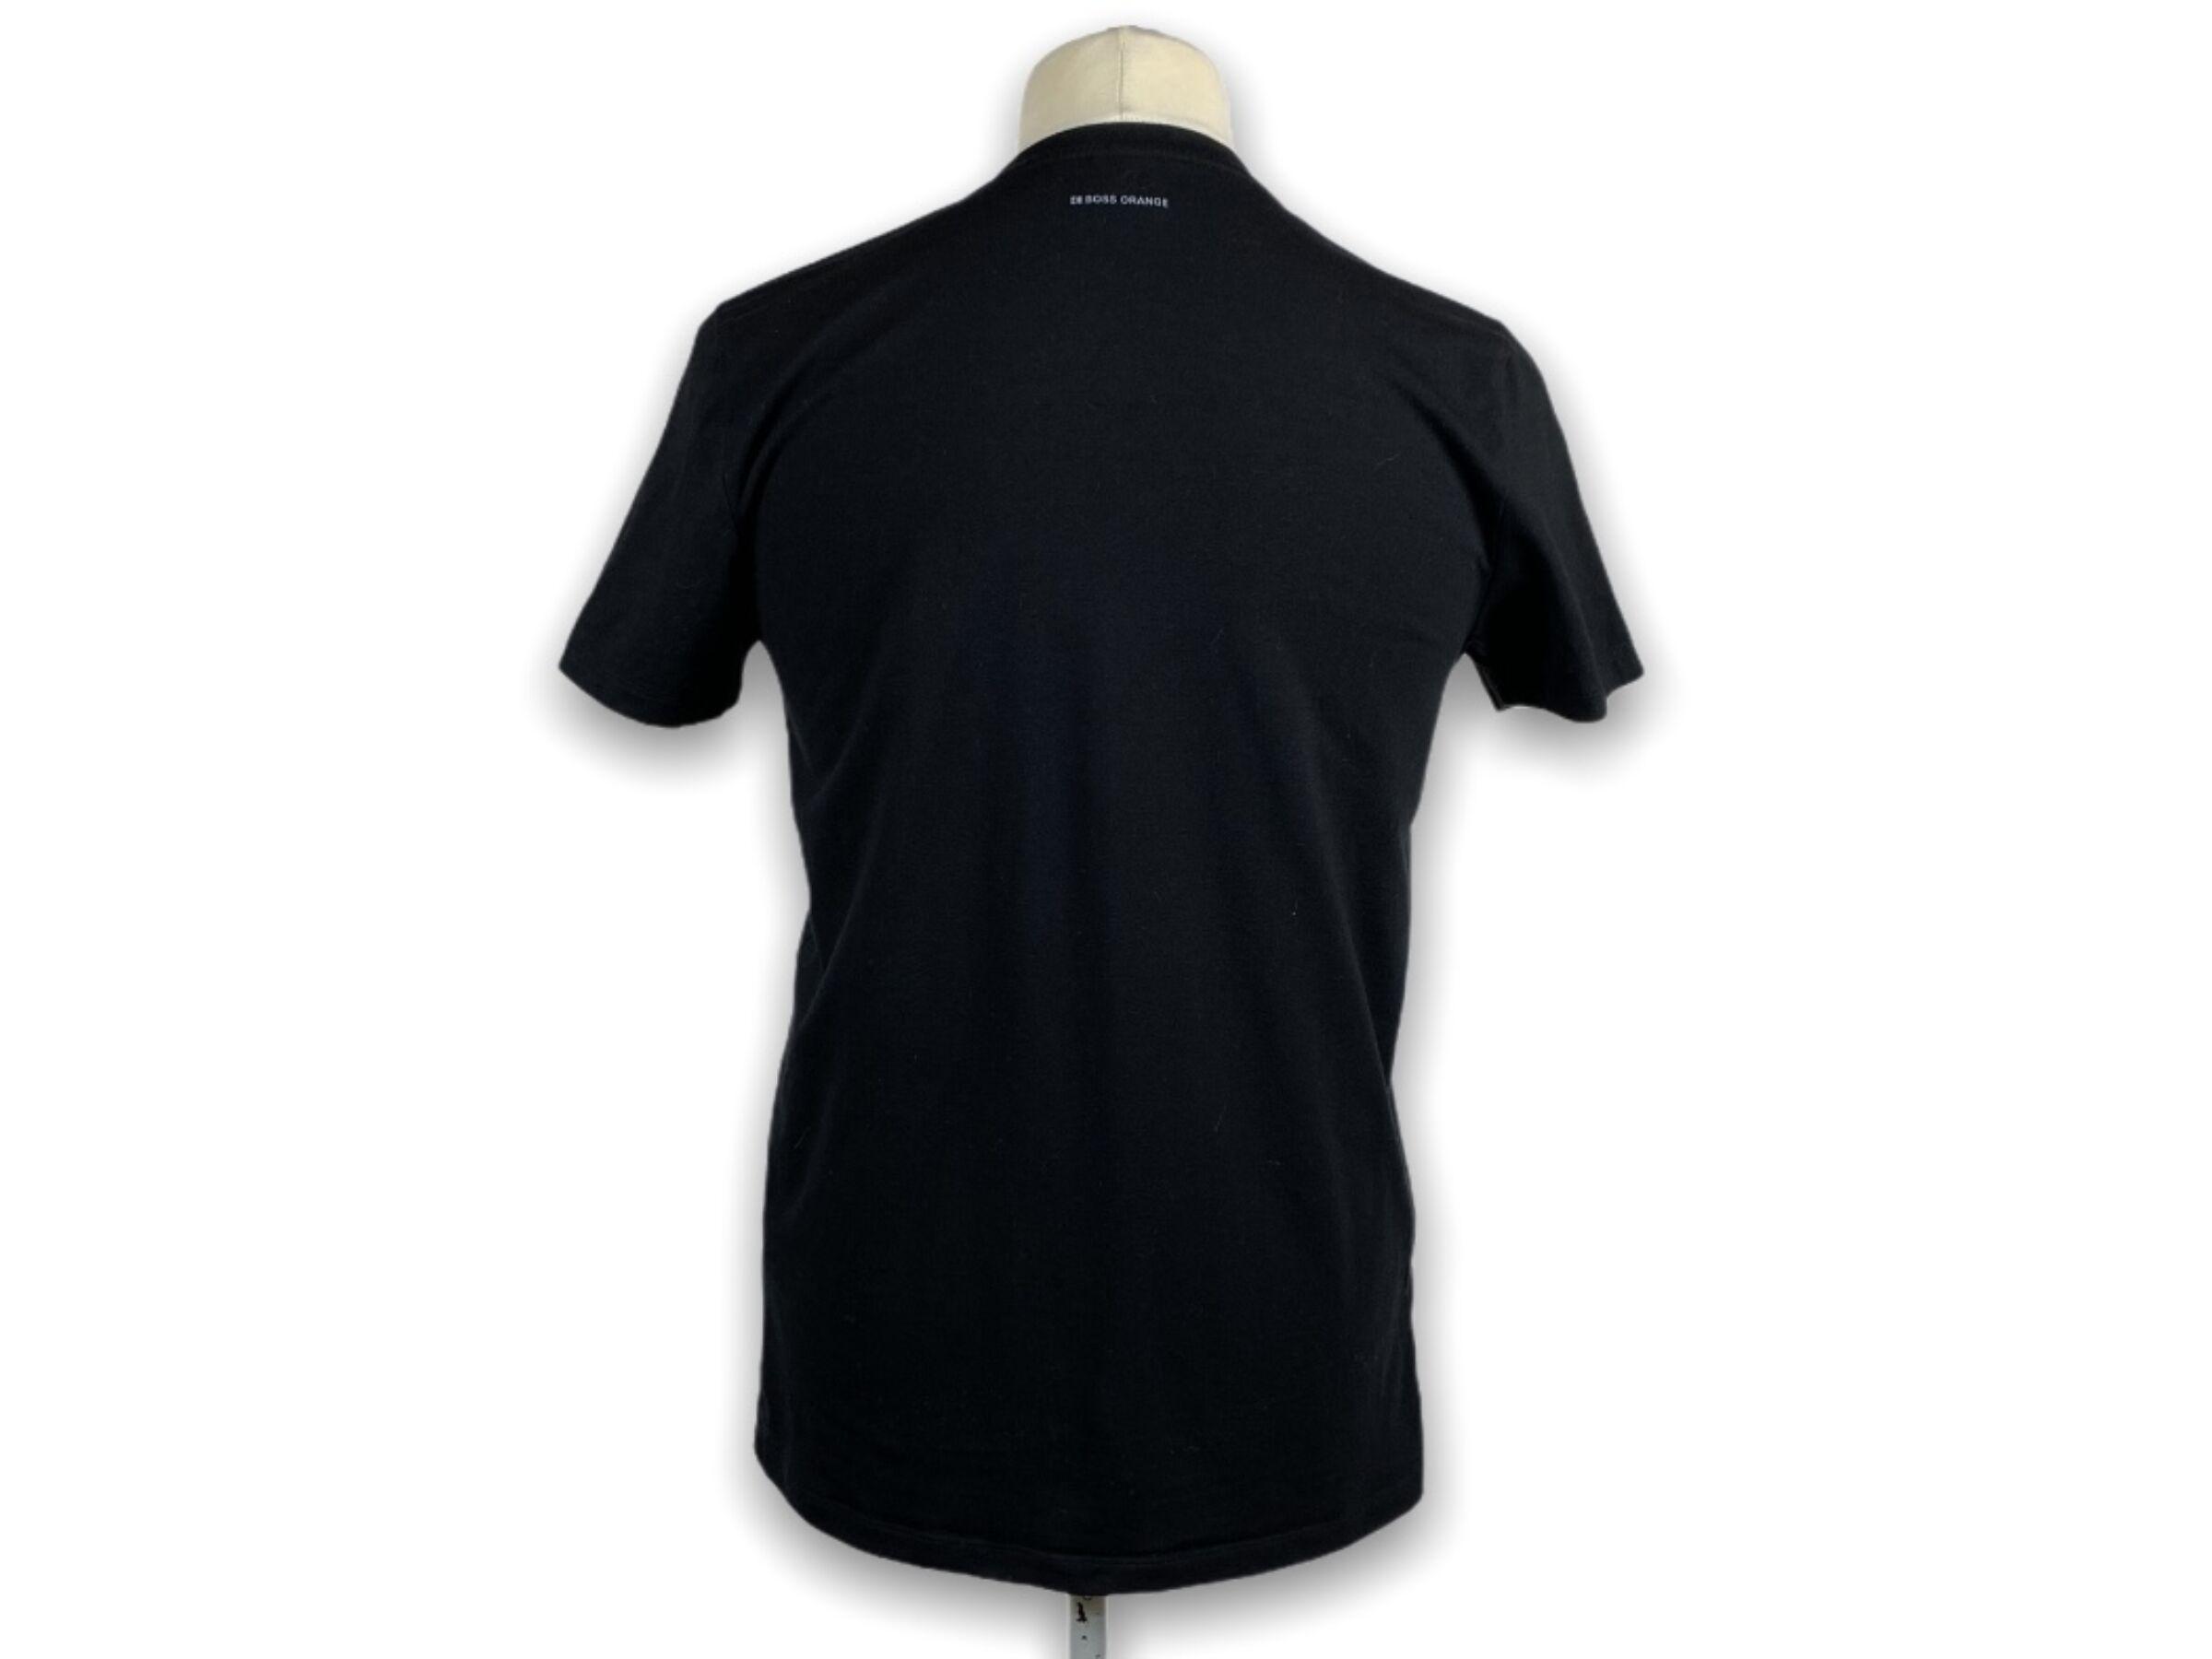 Hugo Boss póló (M)